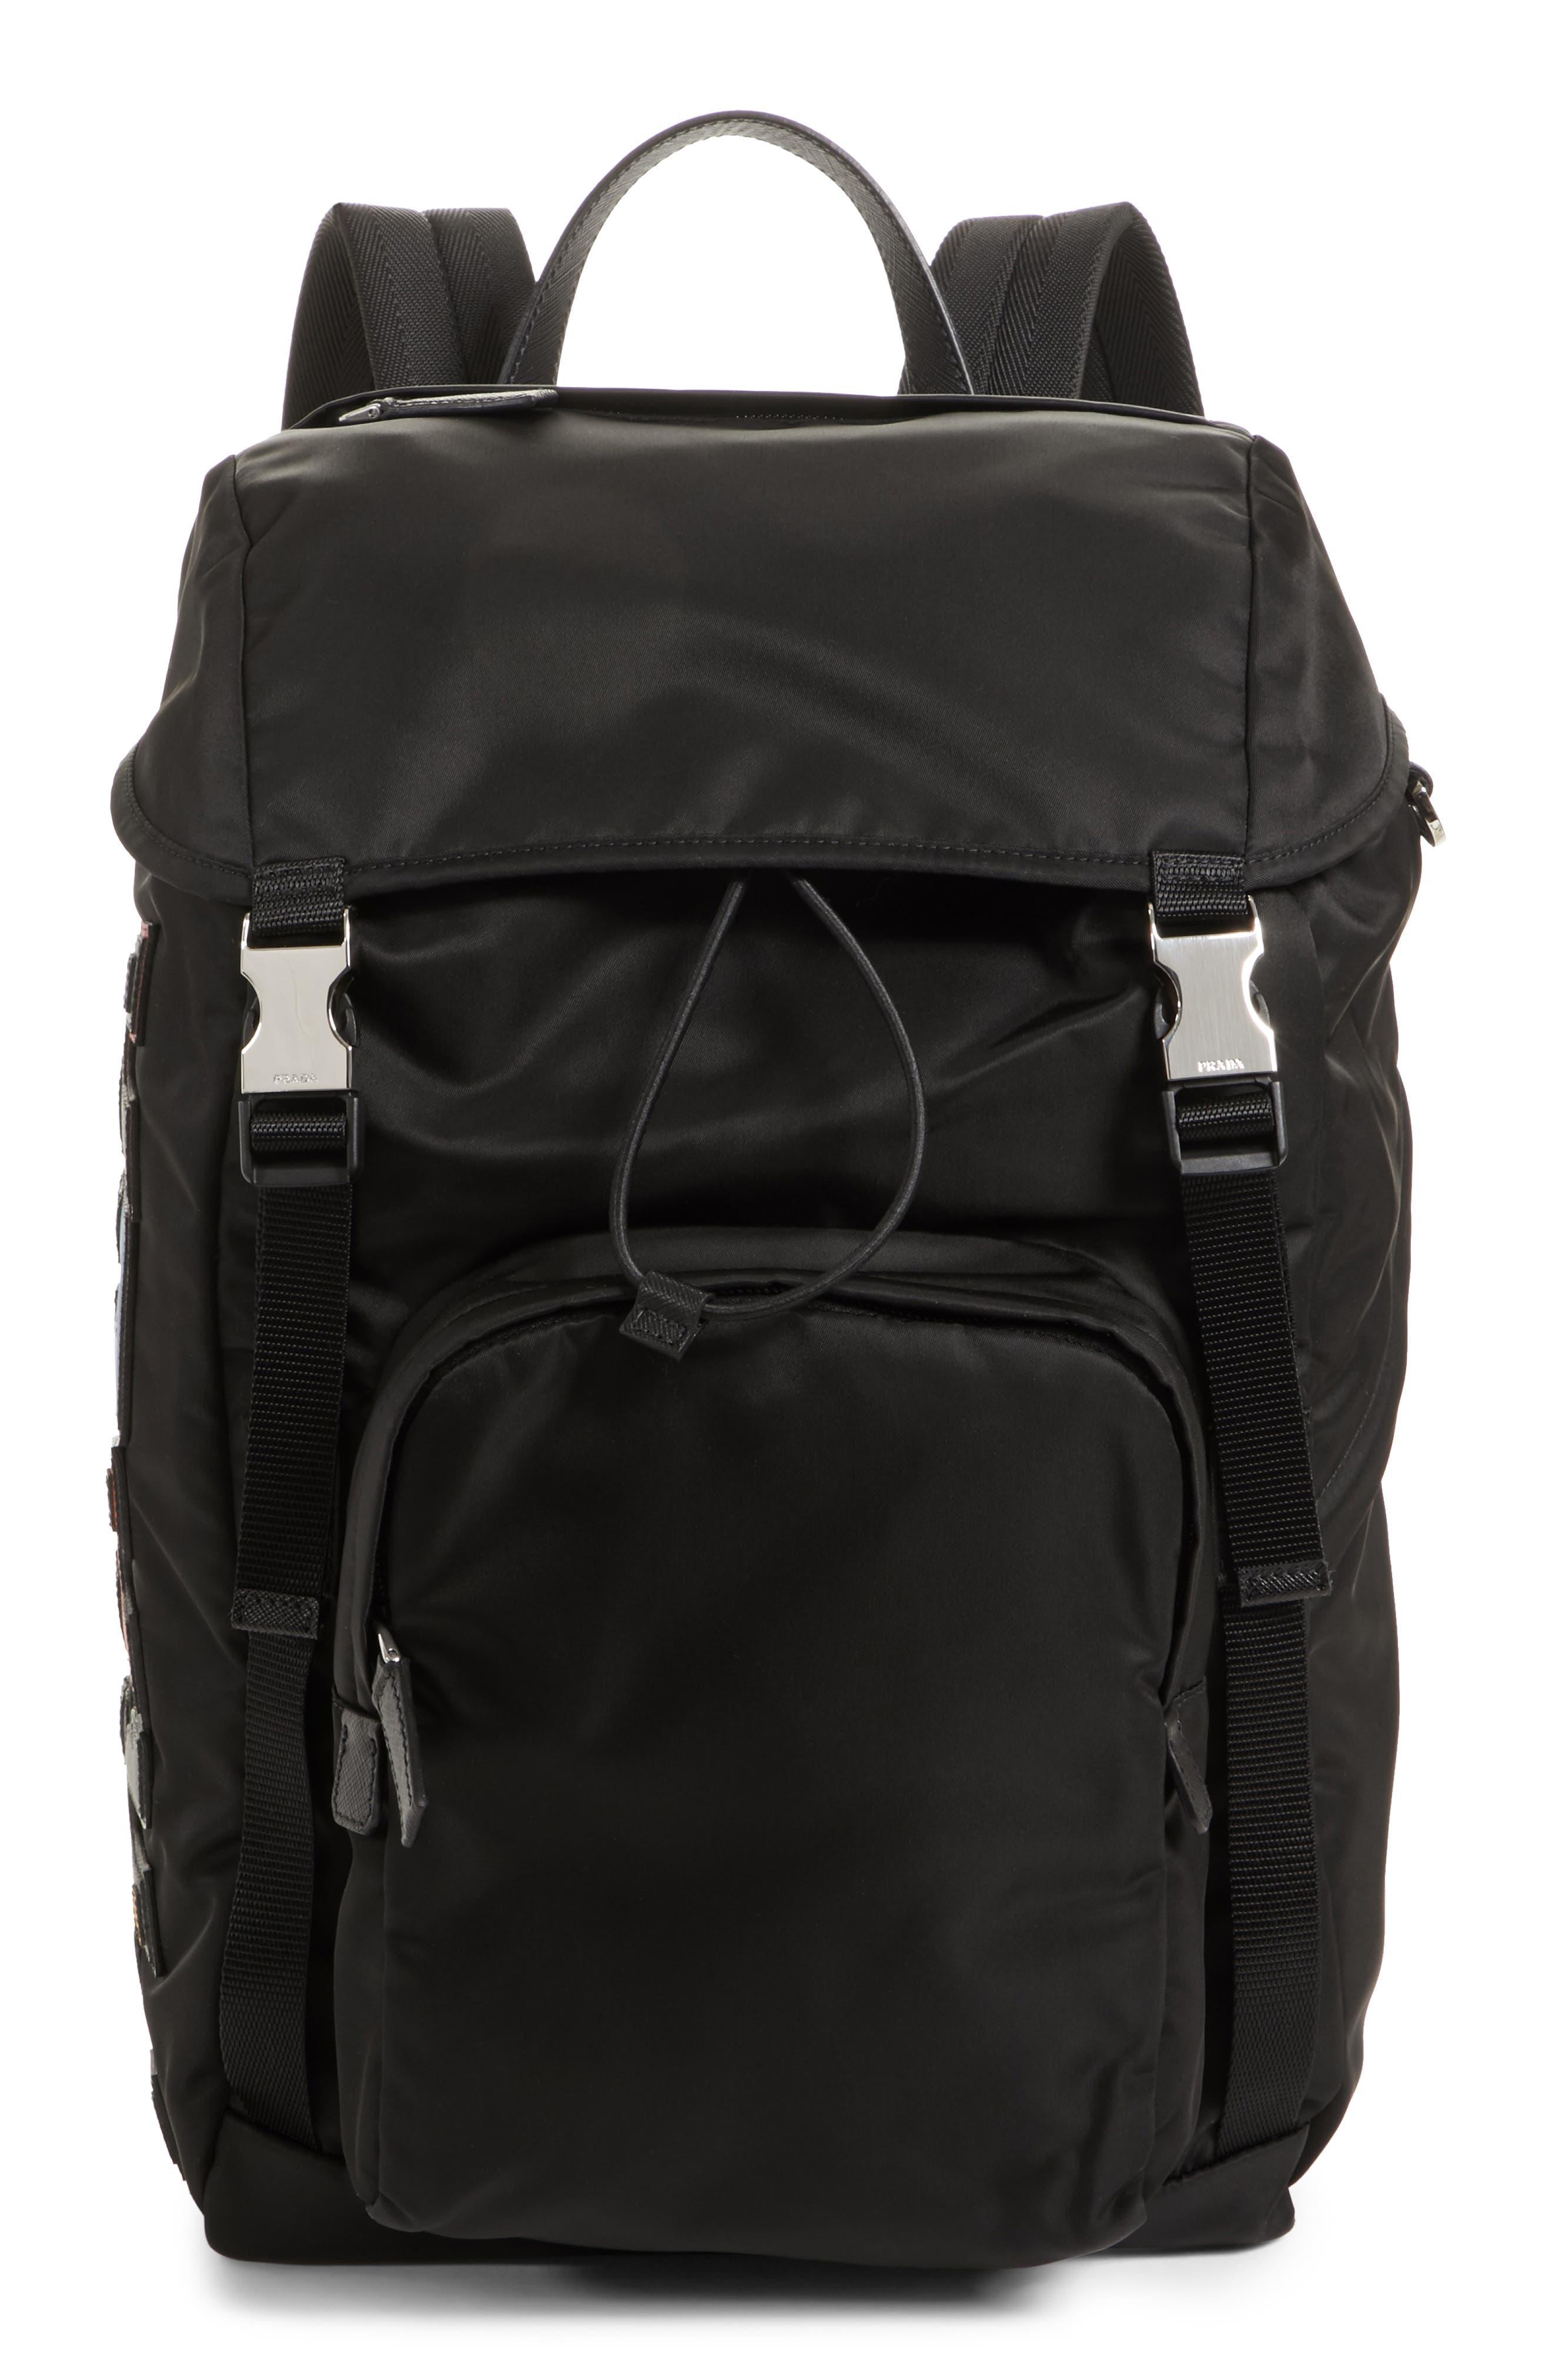 Character Backpack,                         Main,                         color, F0sgi Nero M